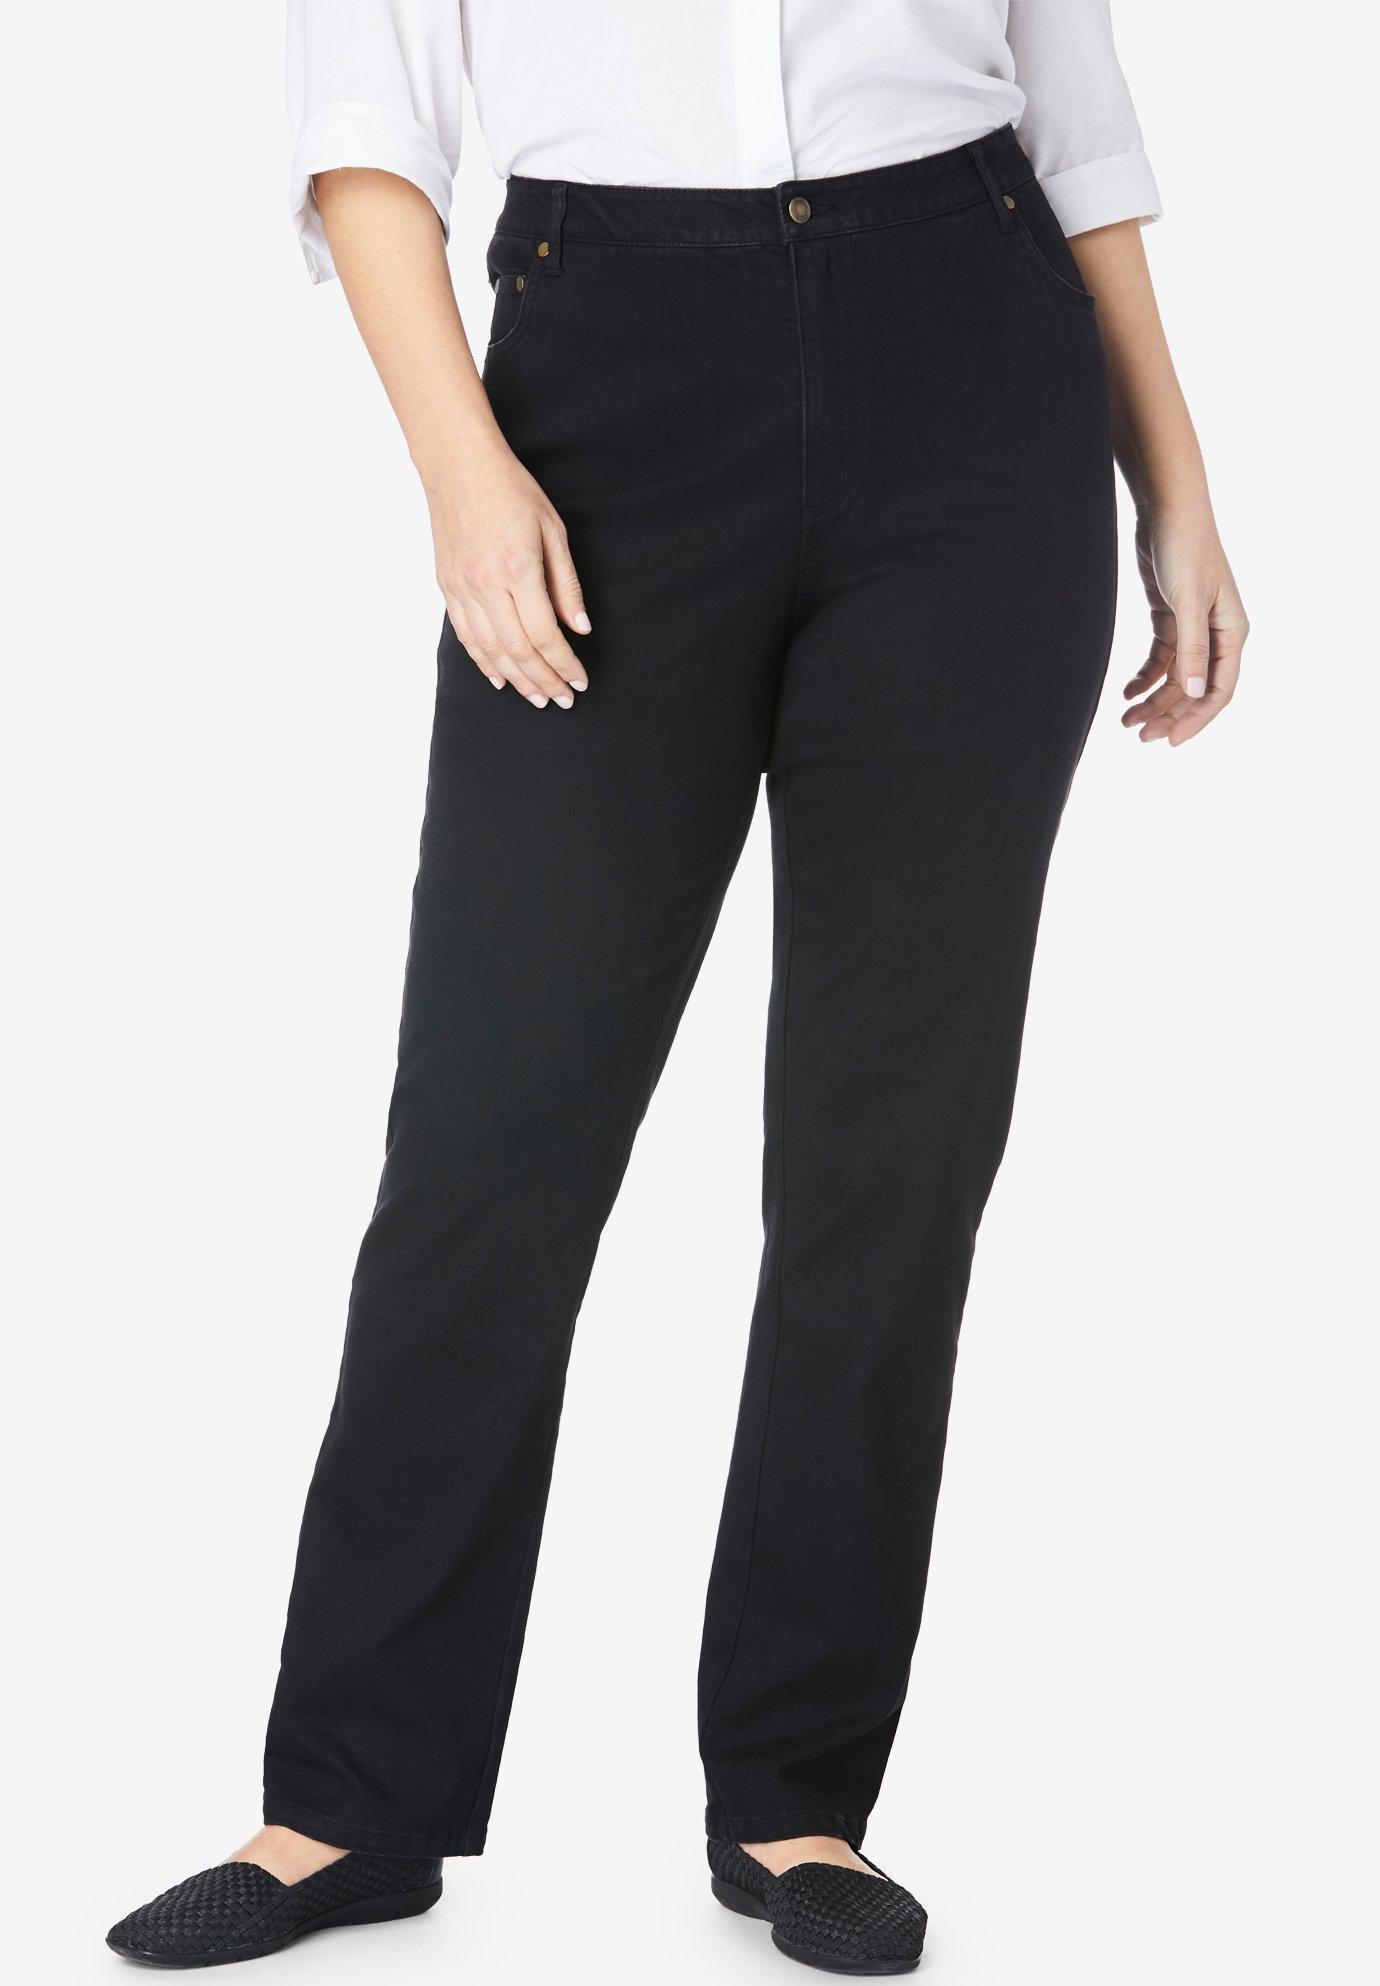 Straight Leg Stretch Jean| Plus Size Tall | Full Beauty